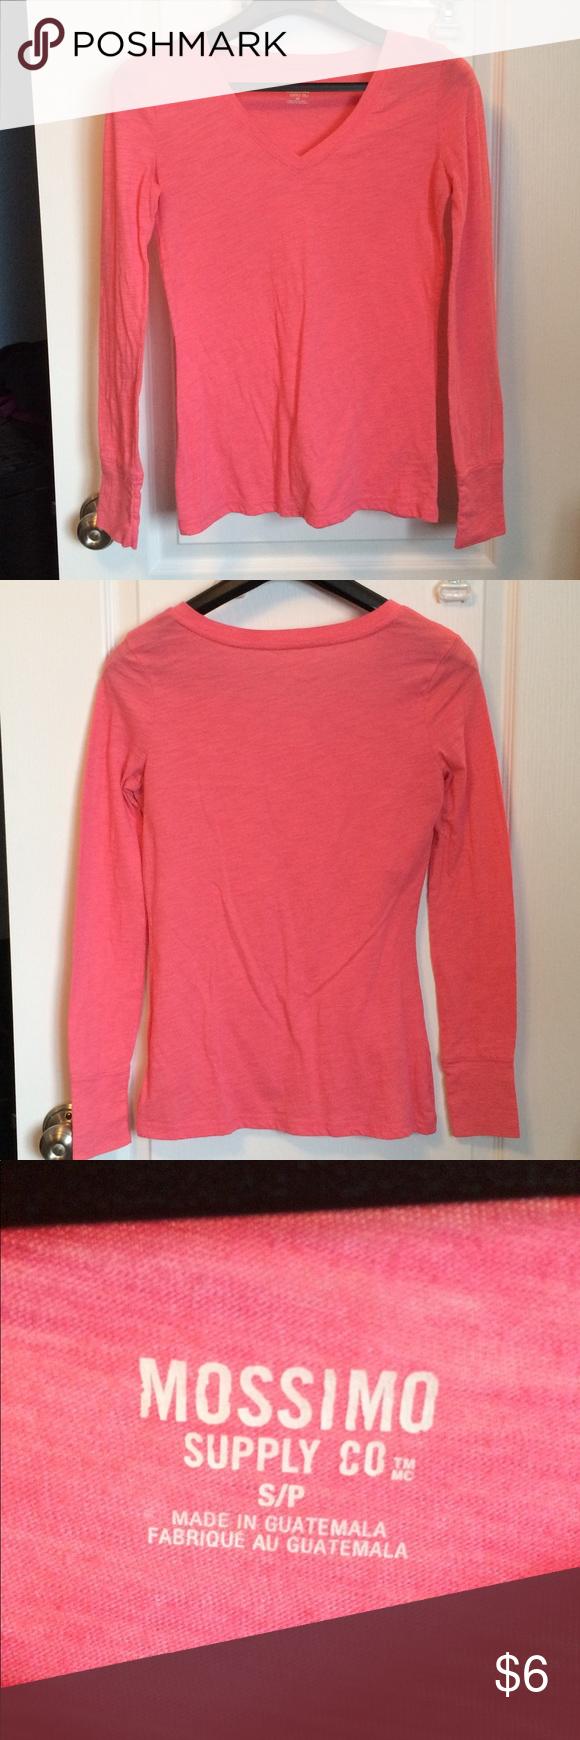 Mossimo Long Sleeve Coral Colored Shirt Like New My Posh Picks